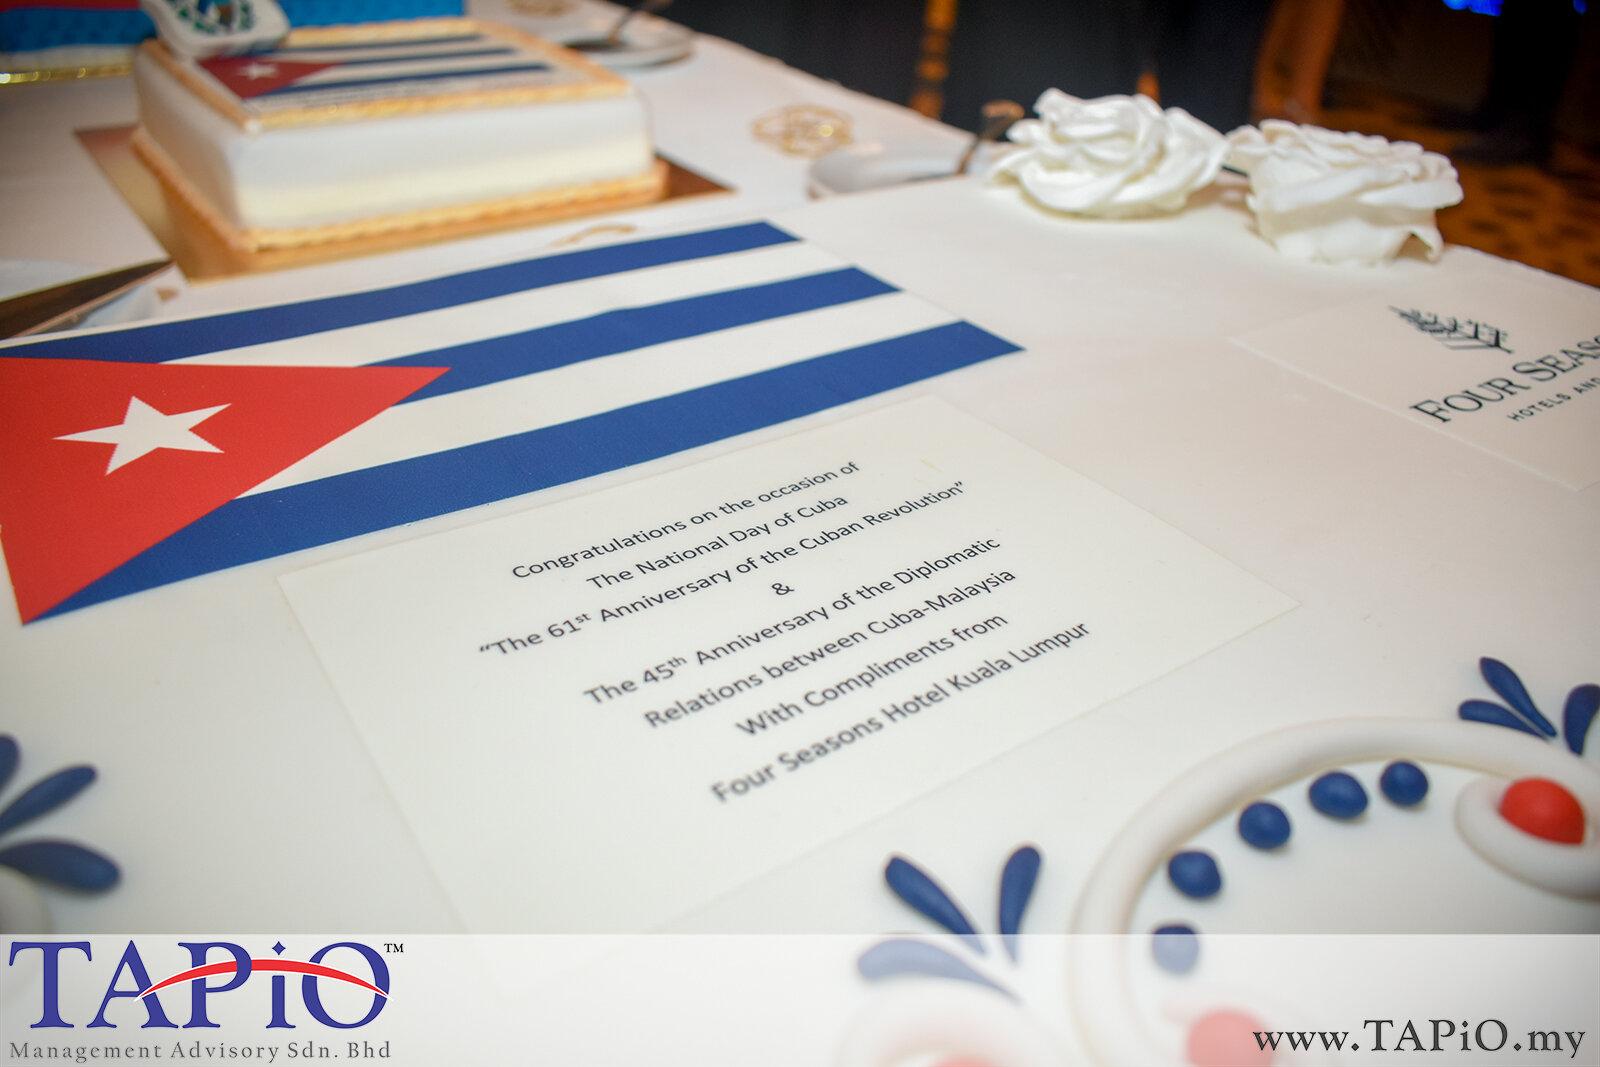 20200213 - 61st Anniversary of the Cuban Revolution